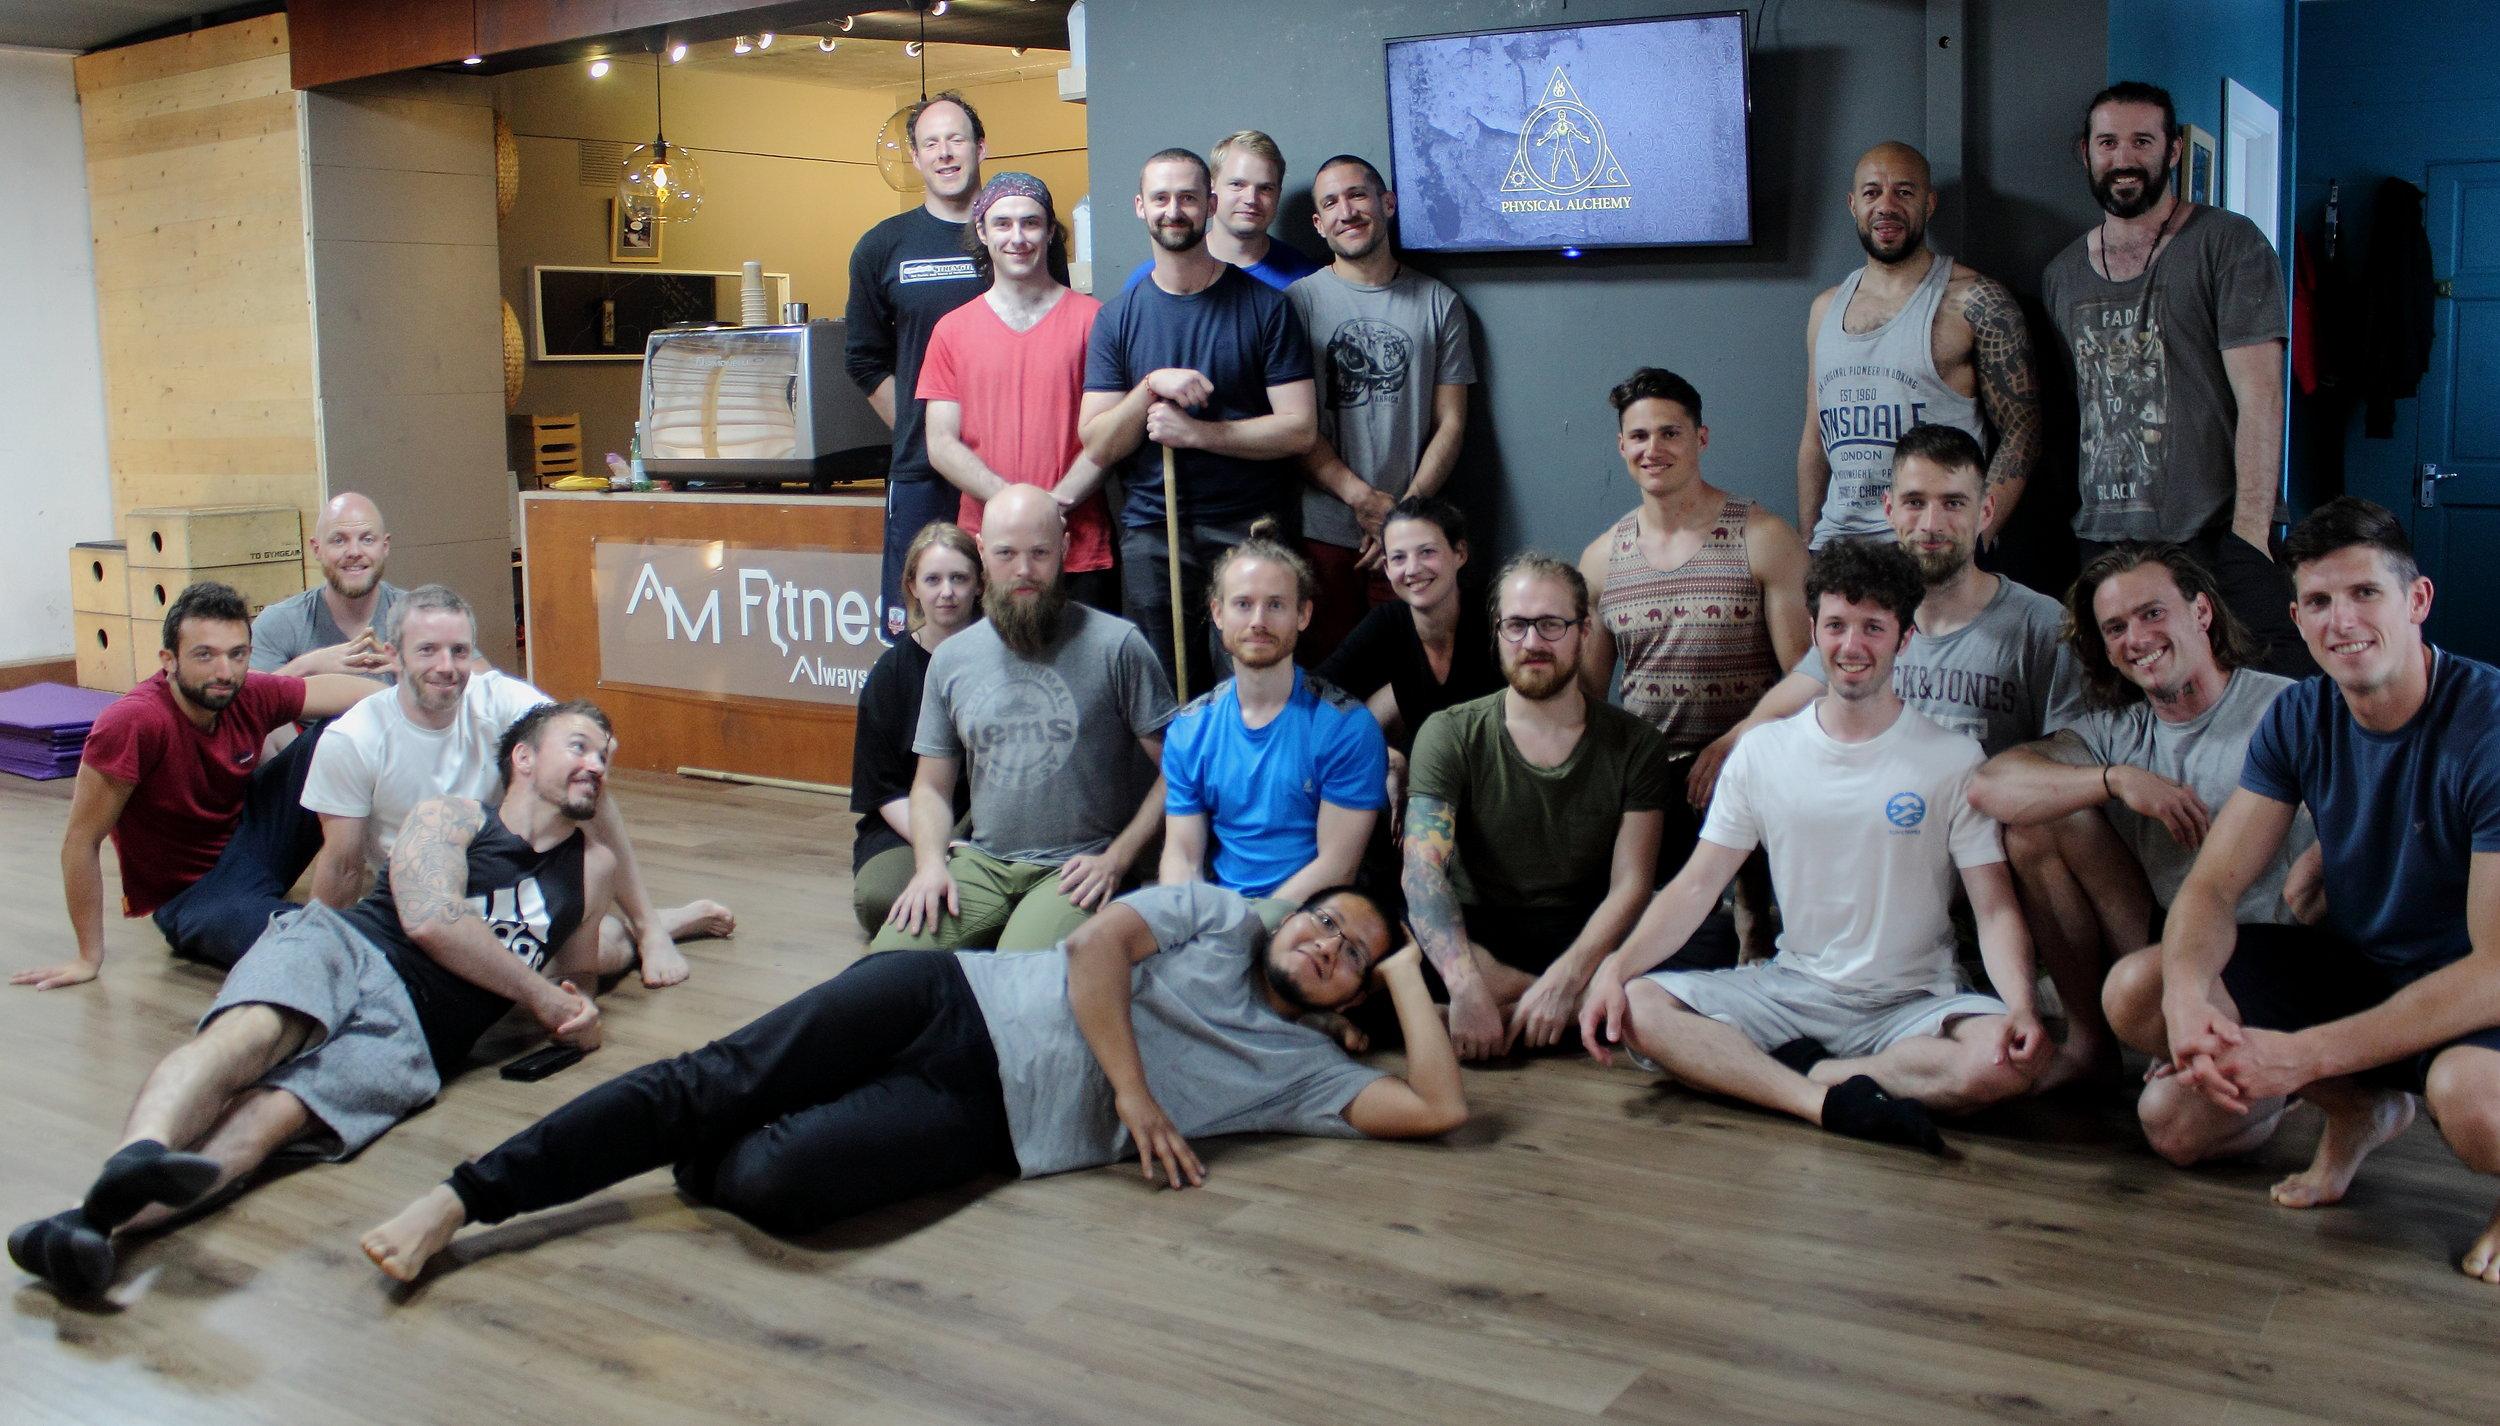 Physical Alchemy_AM Fitness_June17_Seve -14.JPG